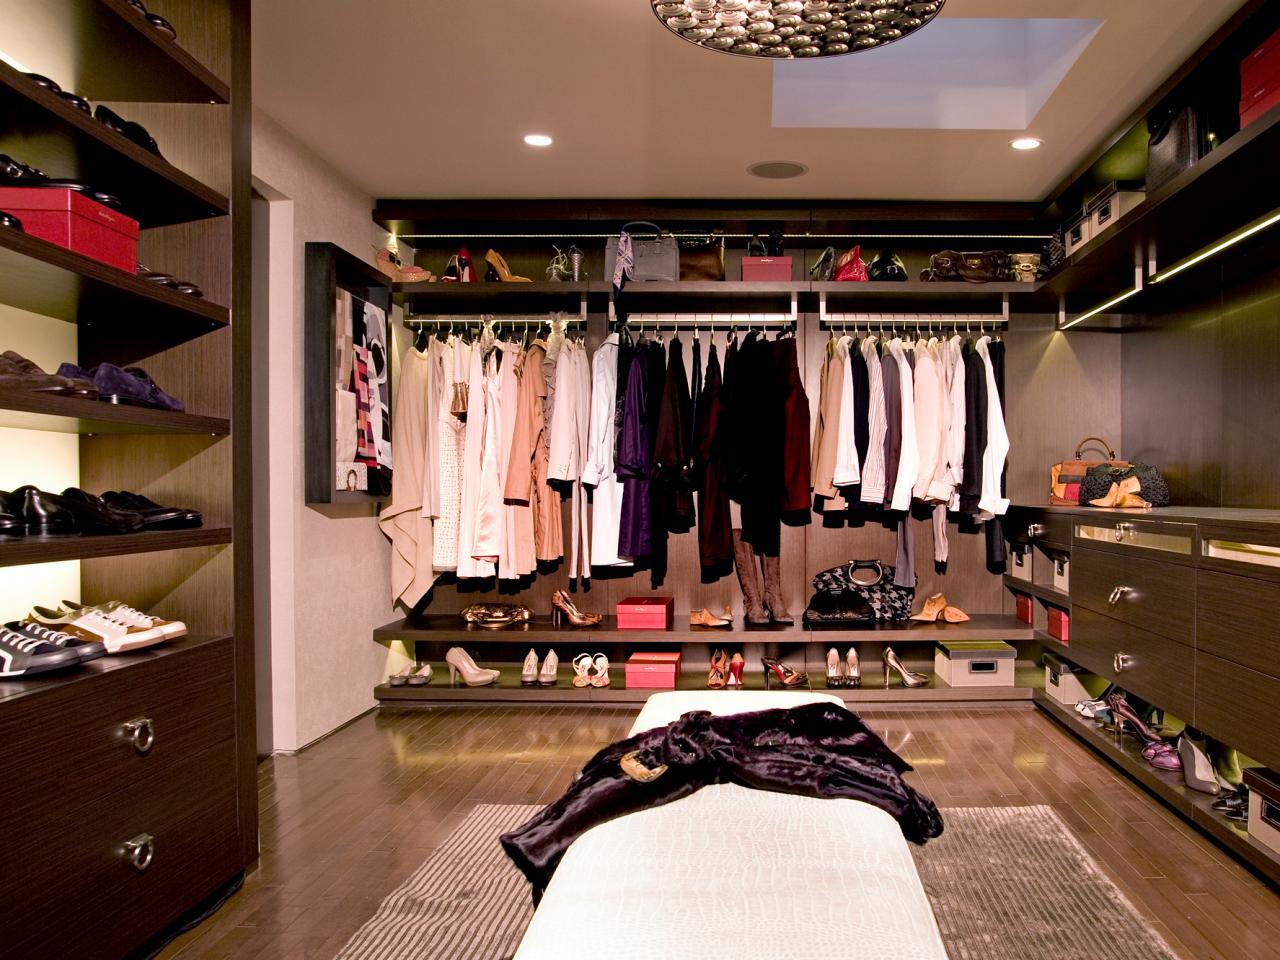 Photos hgtv - Closets designs small spaces design ...